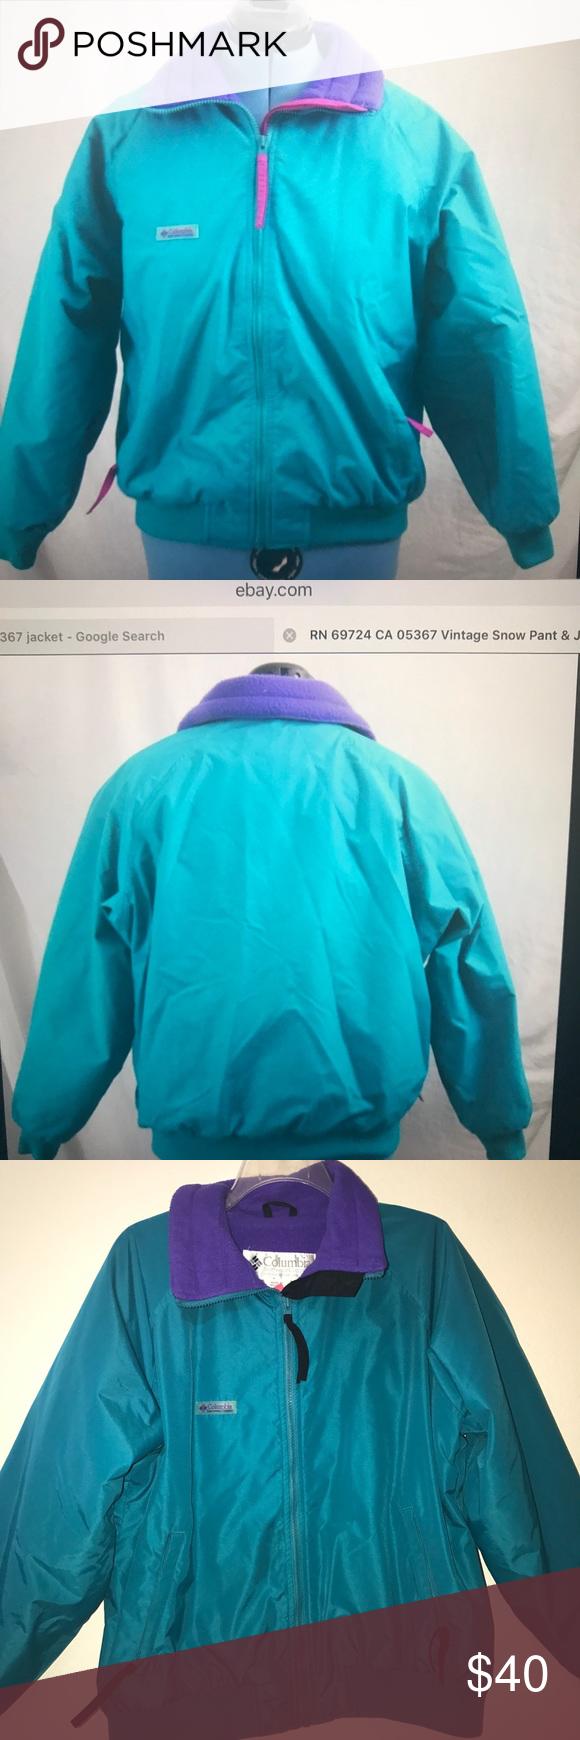 Vintage columbia ski jacket sportswear brand columbia sportswear